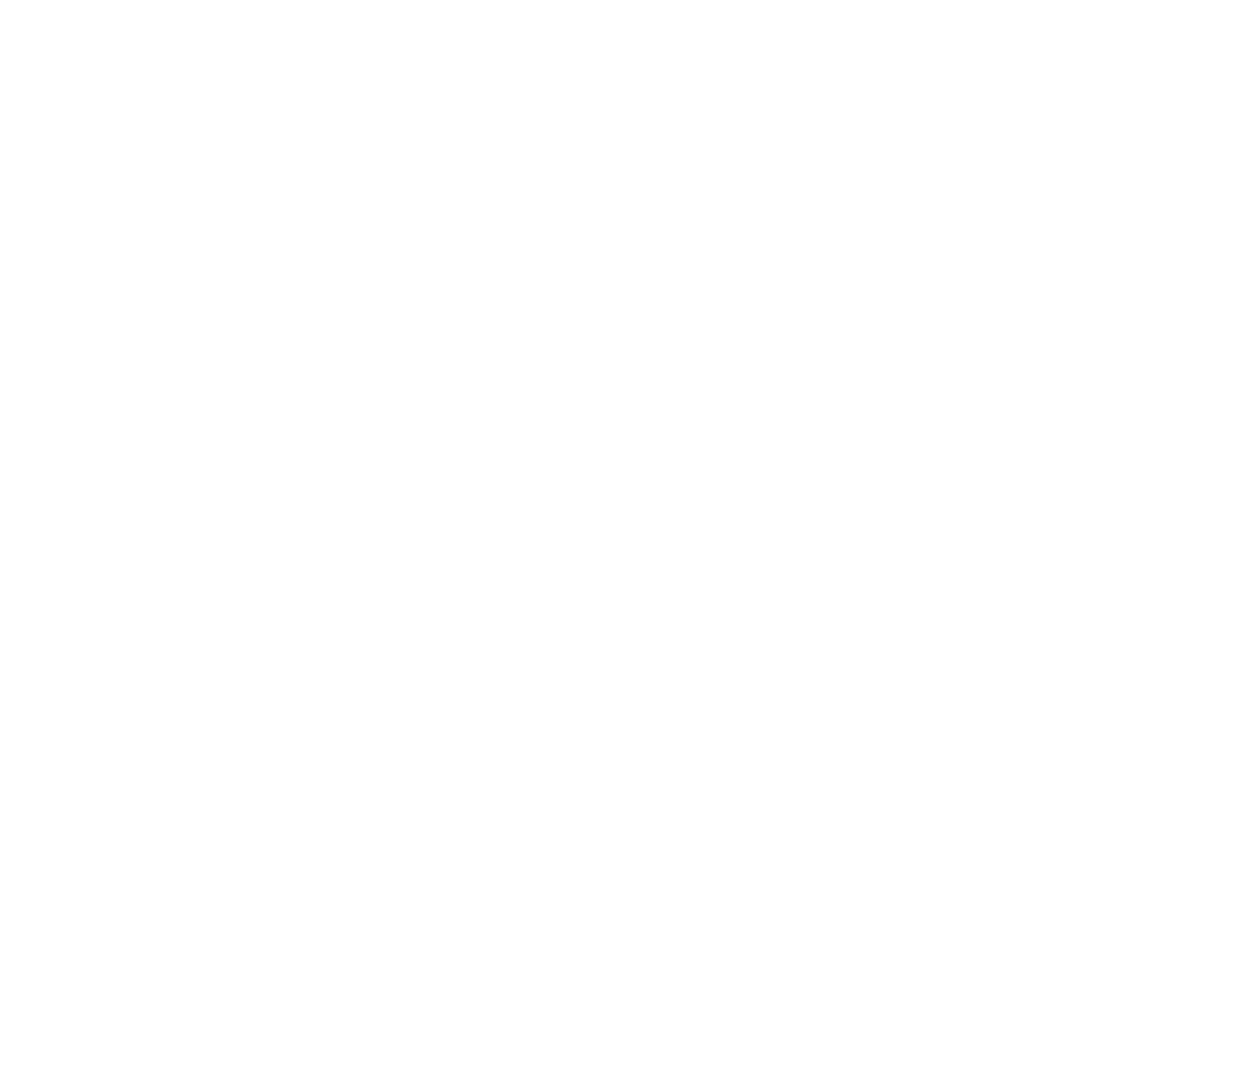 Association of Healthcare Professionals High Performer Award 2019 badge